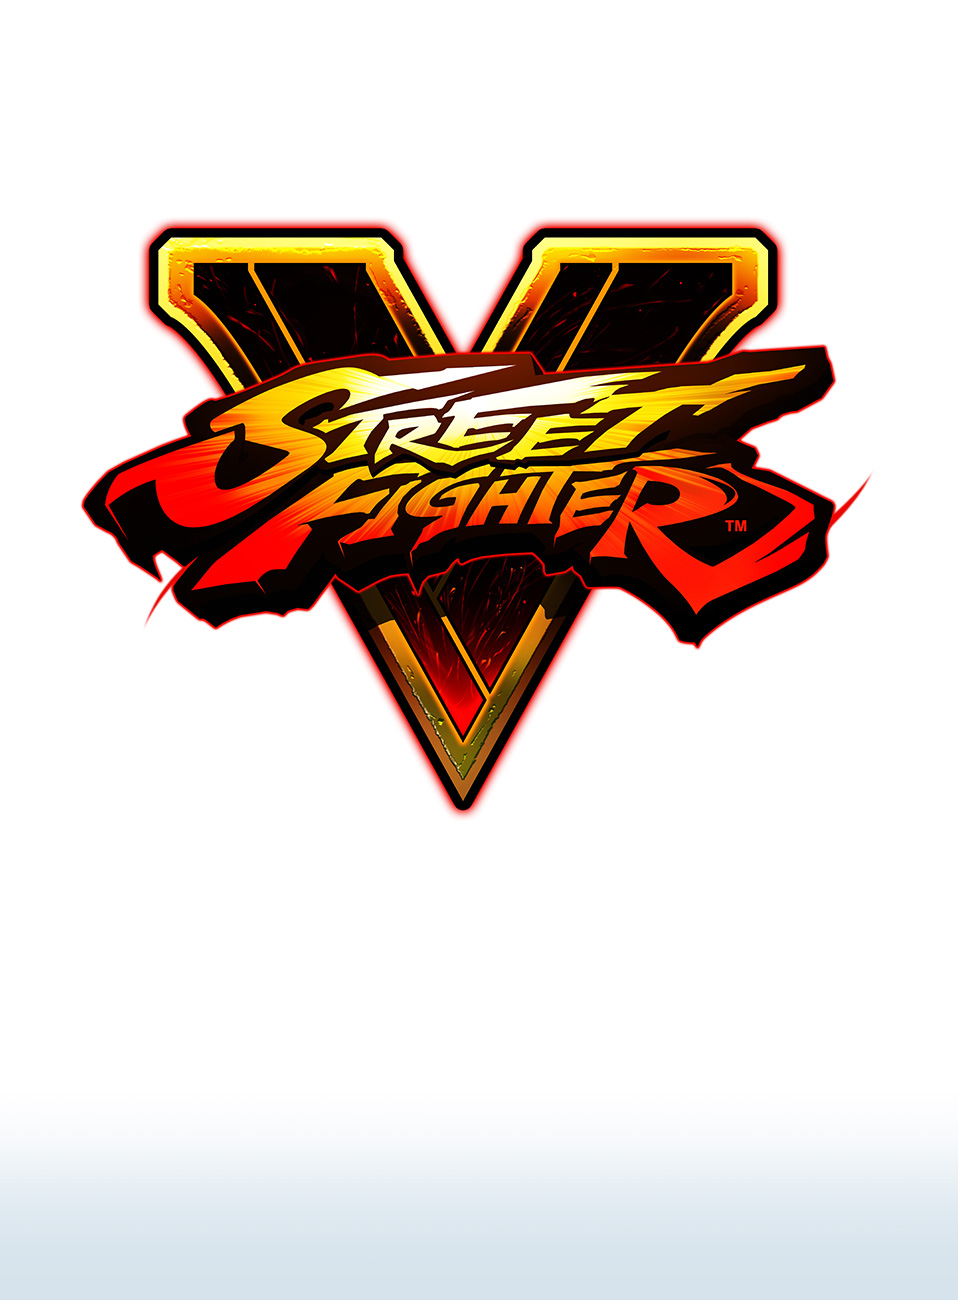 Street fighter 5 for Mobilia webhallen